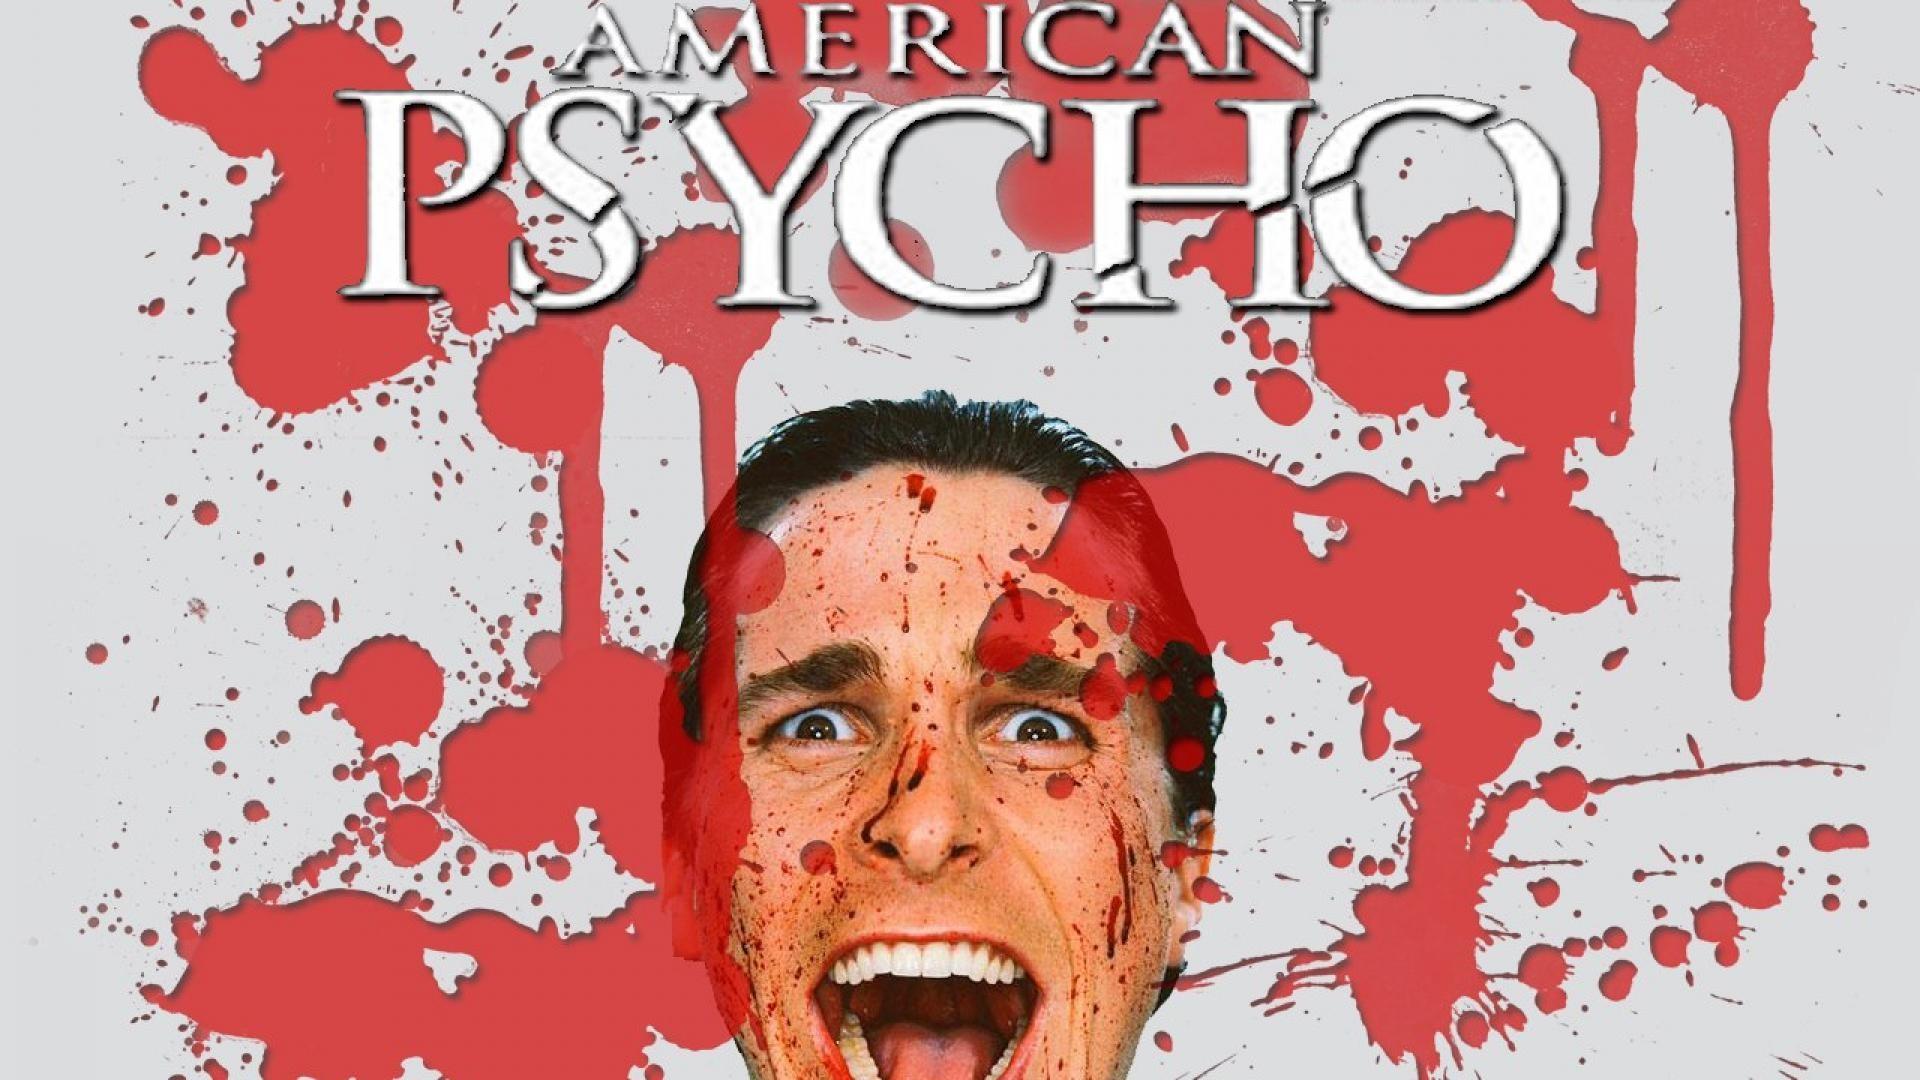 american psycho patrick bateman movies hd wallpaper – (#10145) – HQ .